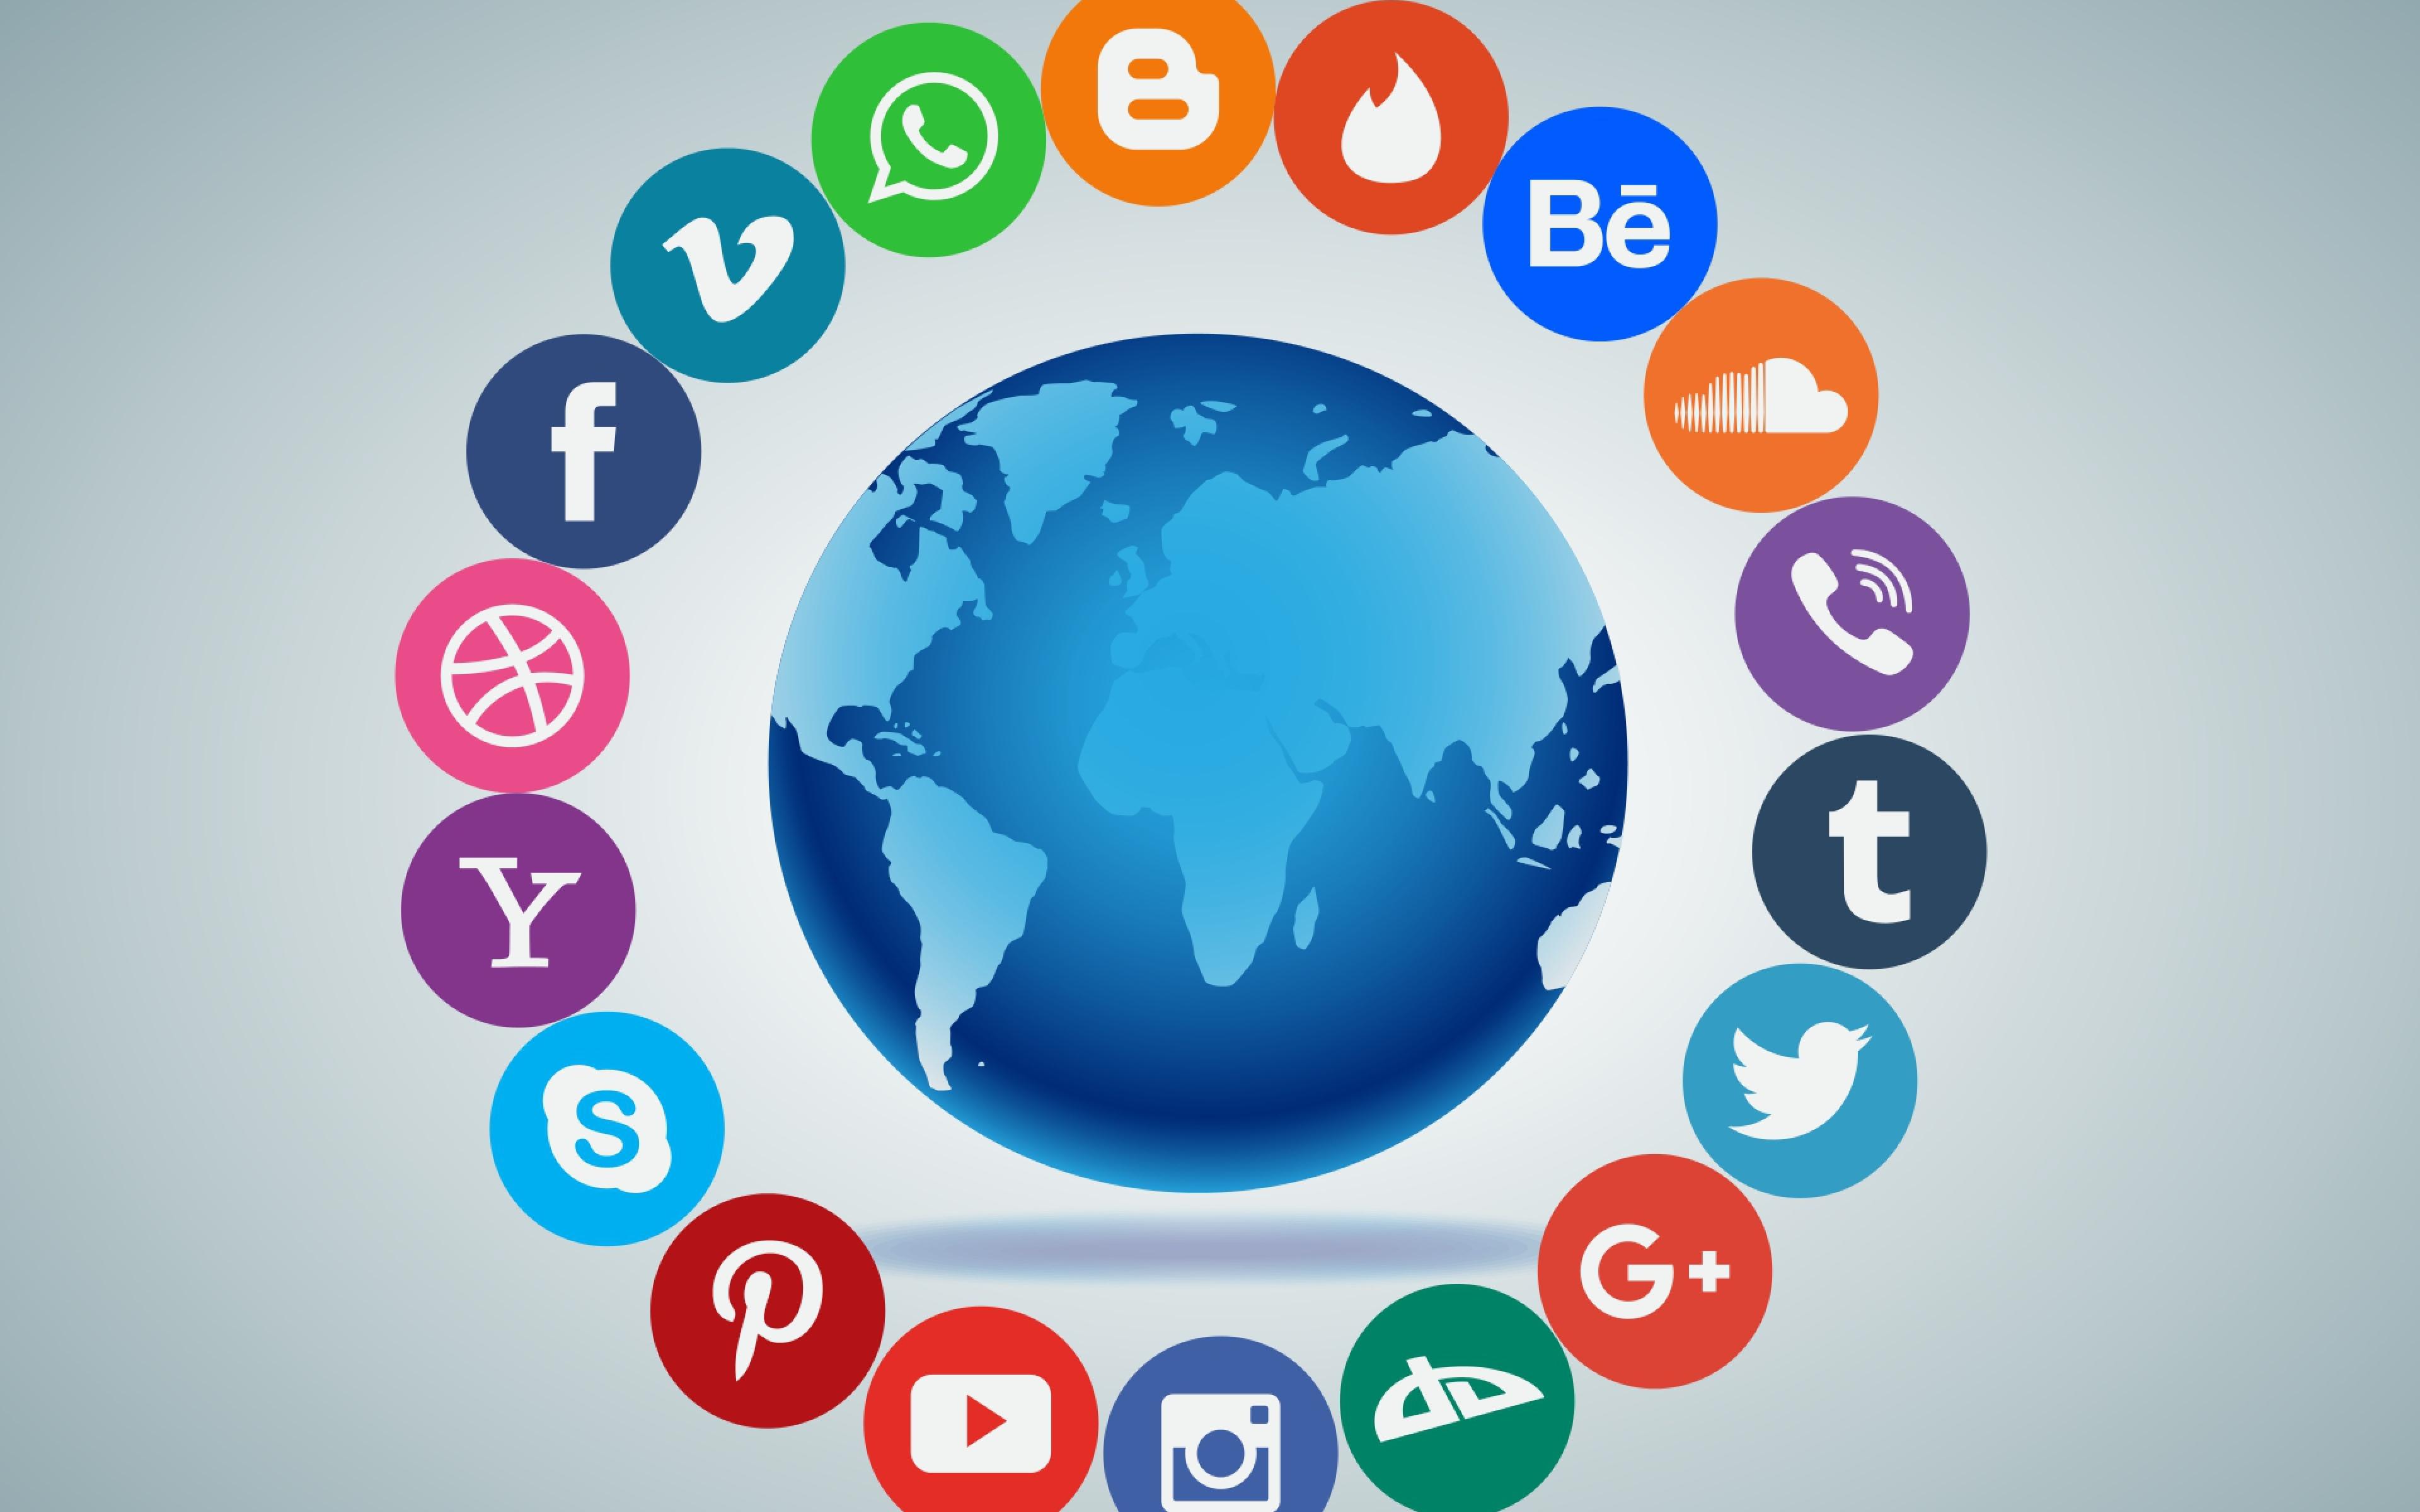 led sign social network - HD1320×825